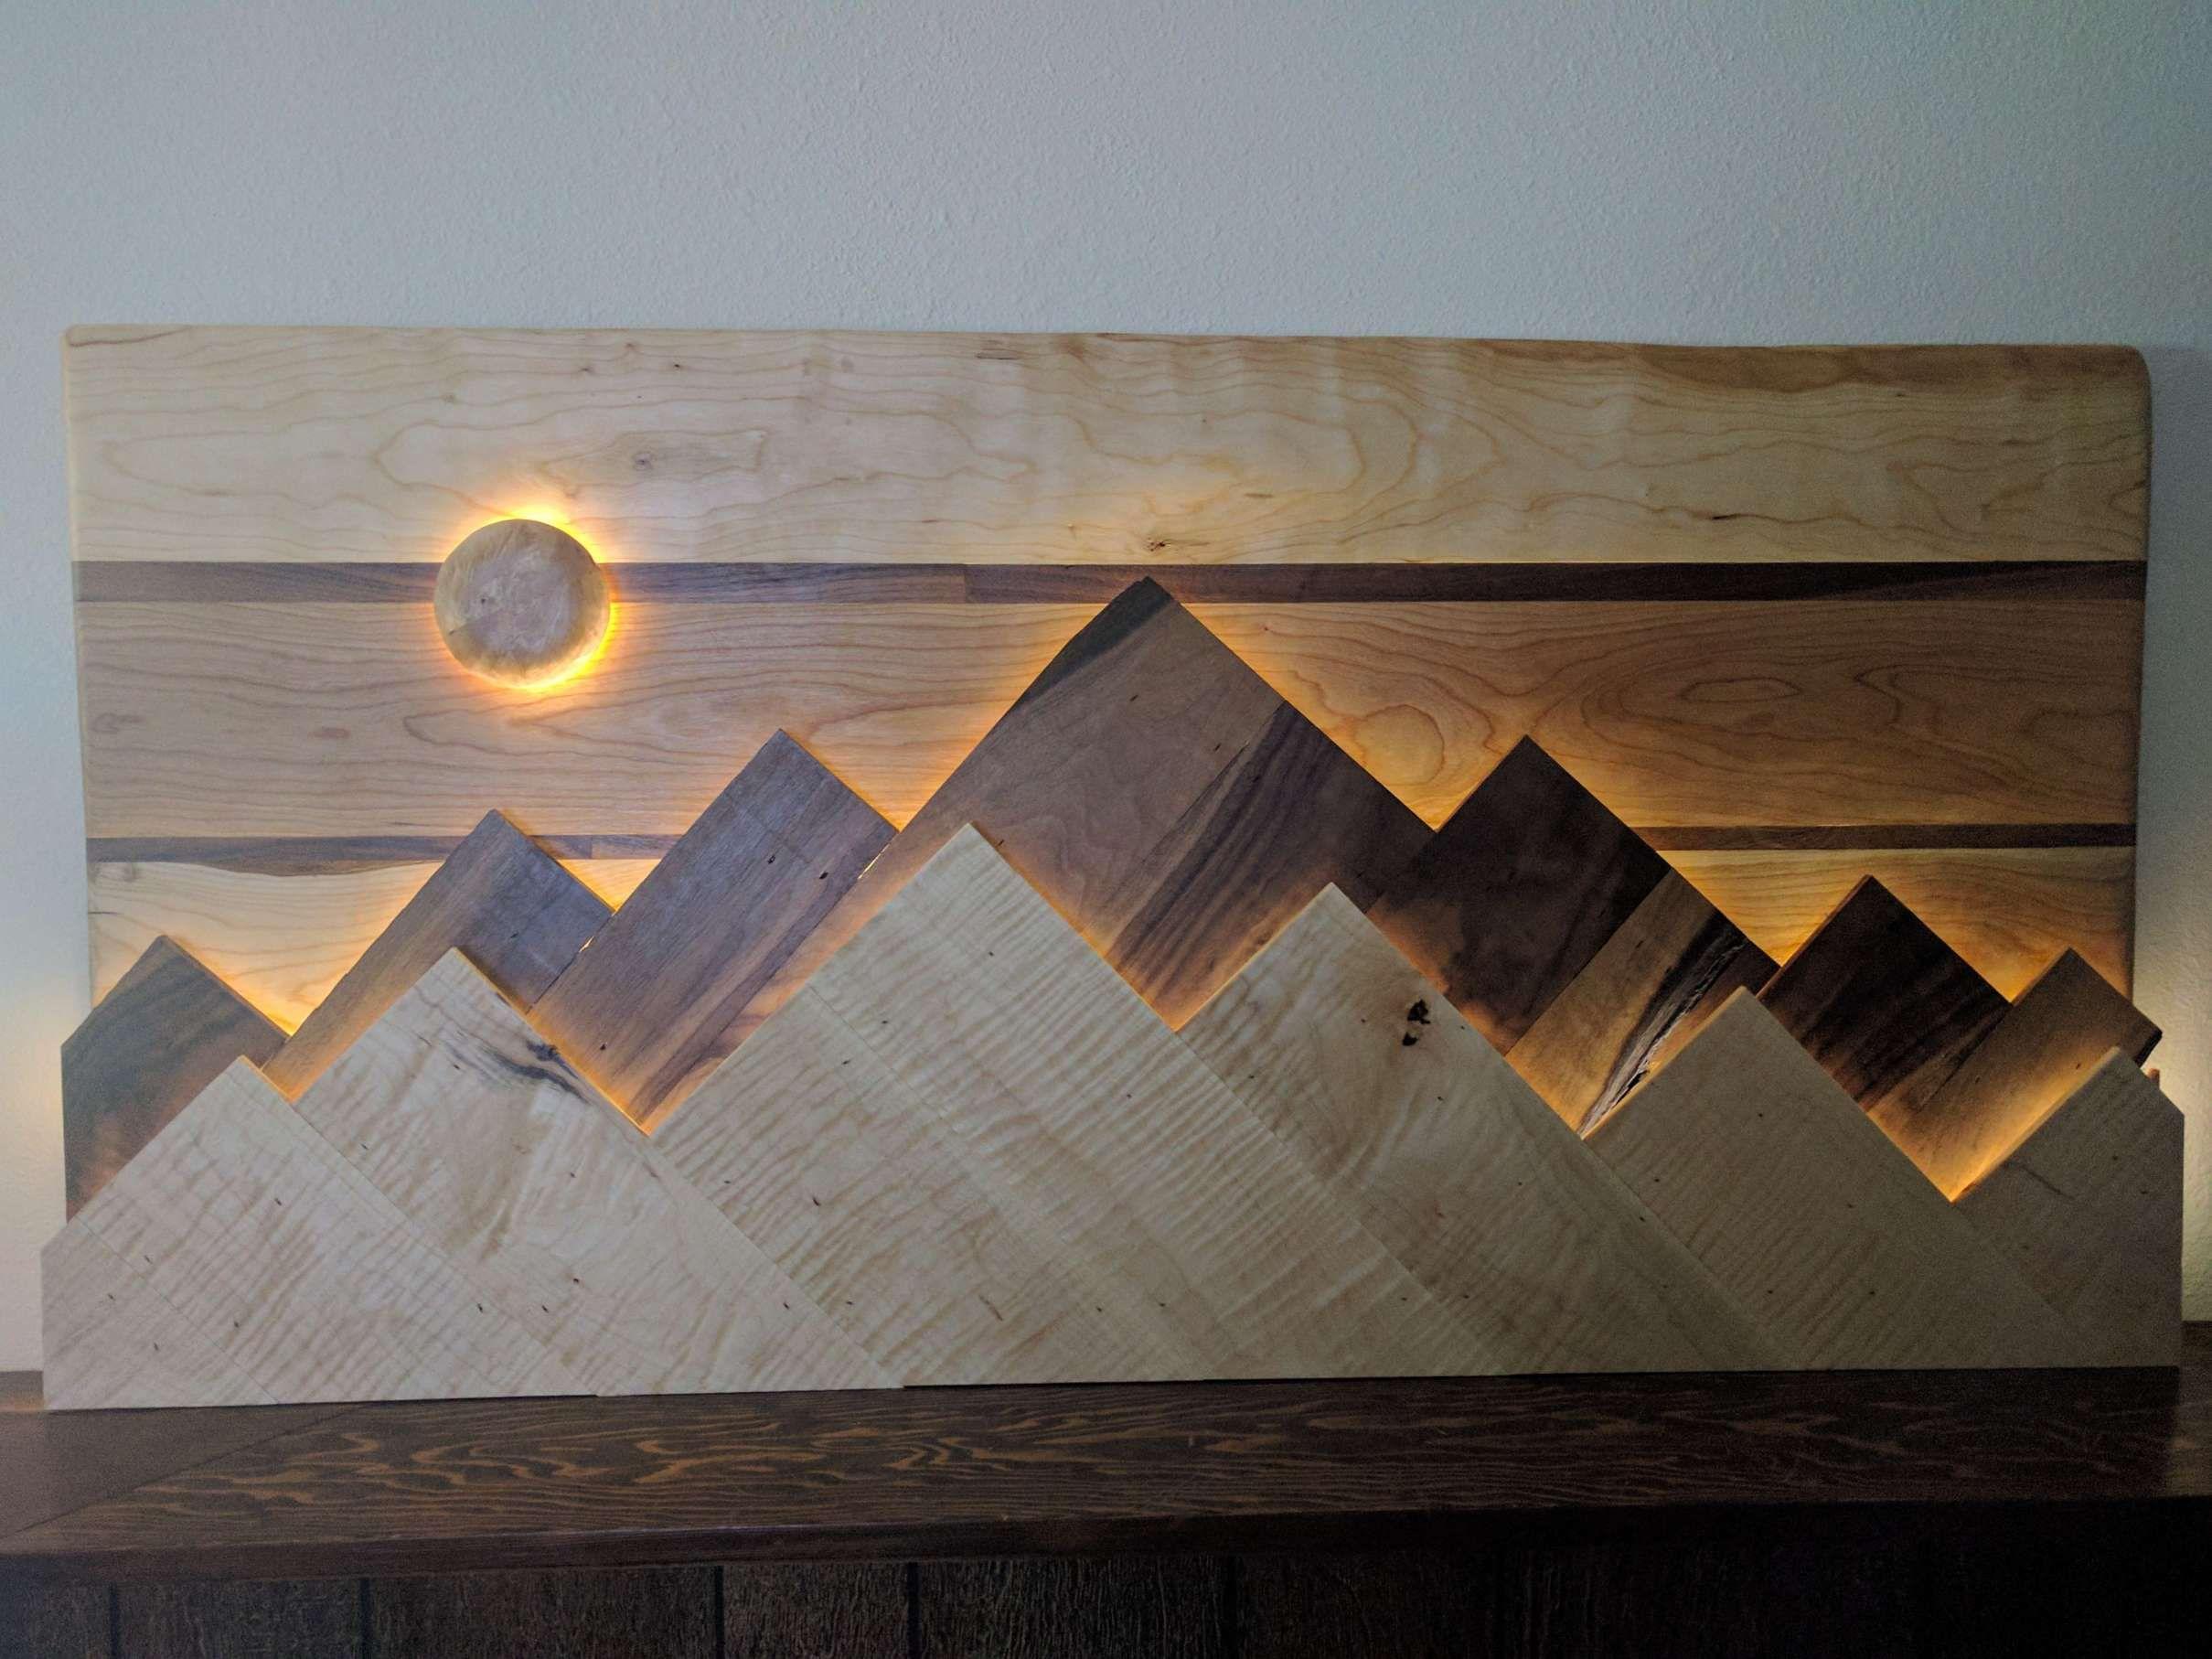 12 Splendid Wood Carving Wall Art Ideas Moon Collection Wooden Wall Decor Diy Wall Art Wood Wall Art